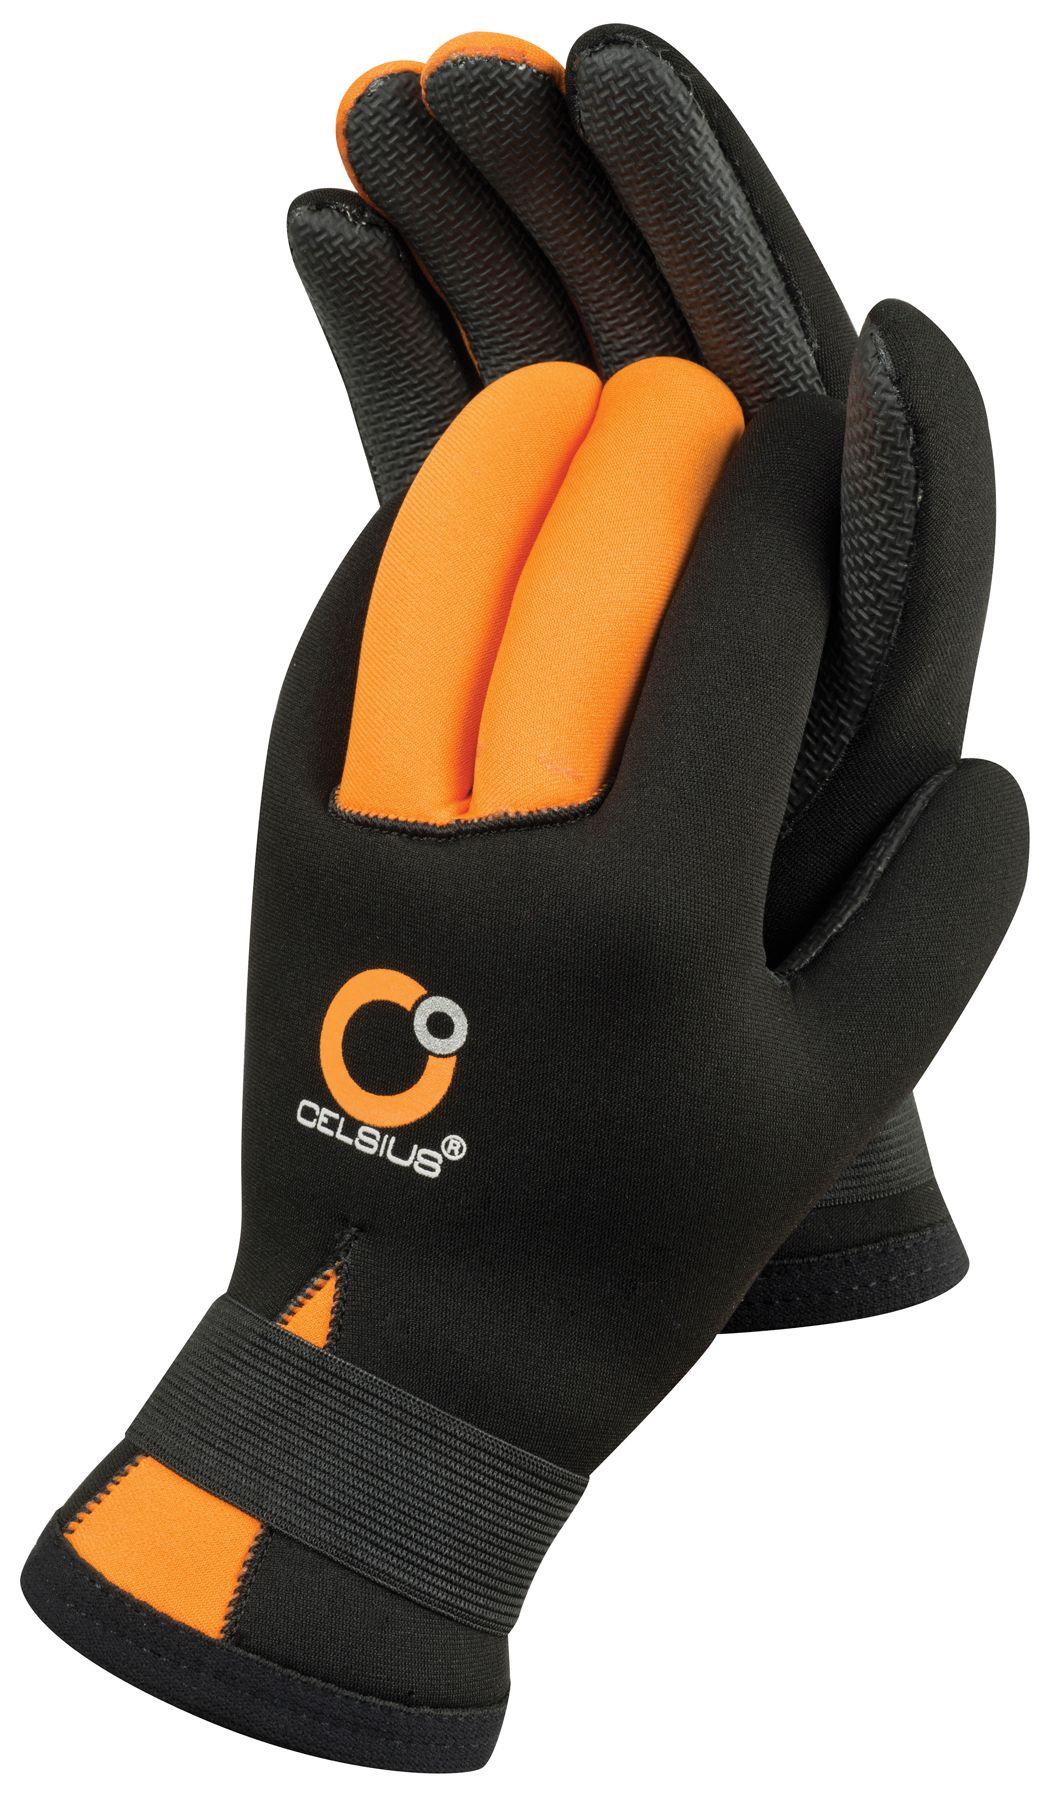 Ladies leather gloves designer - Product Image Celsius Deluxe Neoprene Gloves